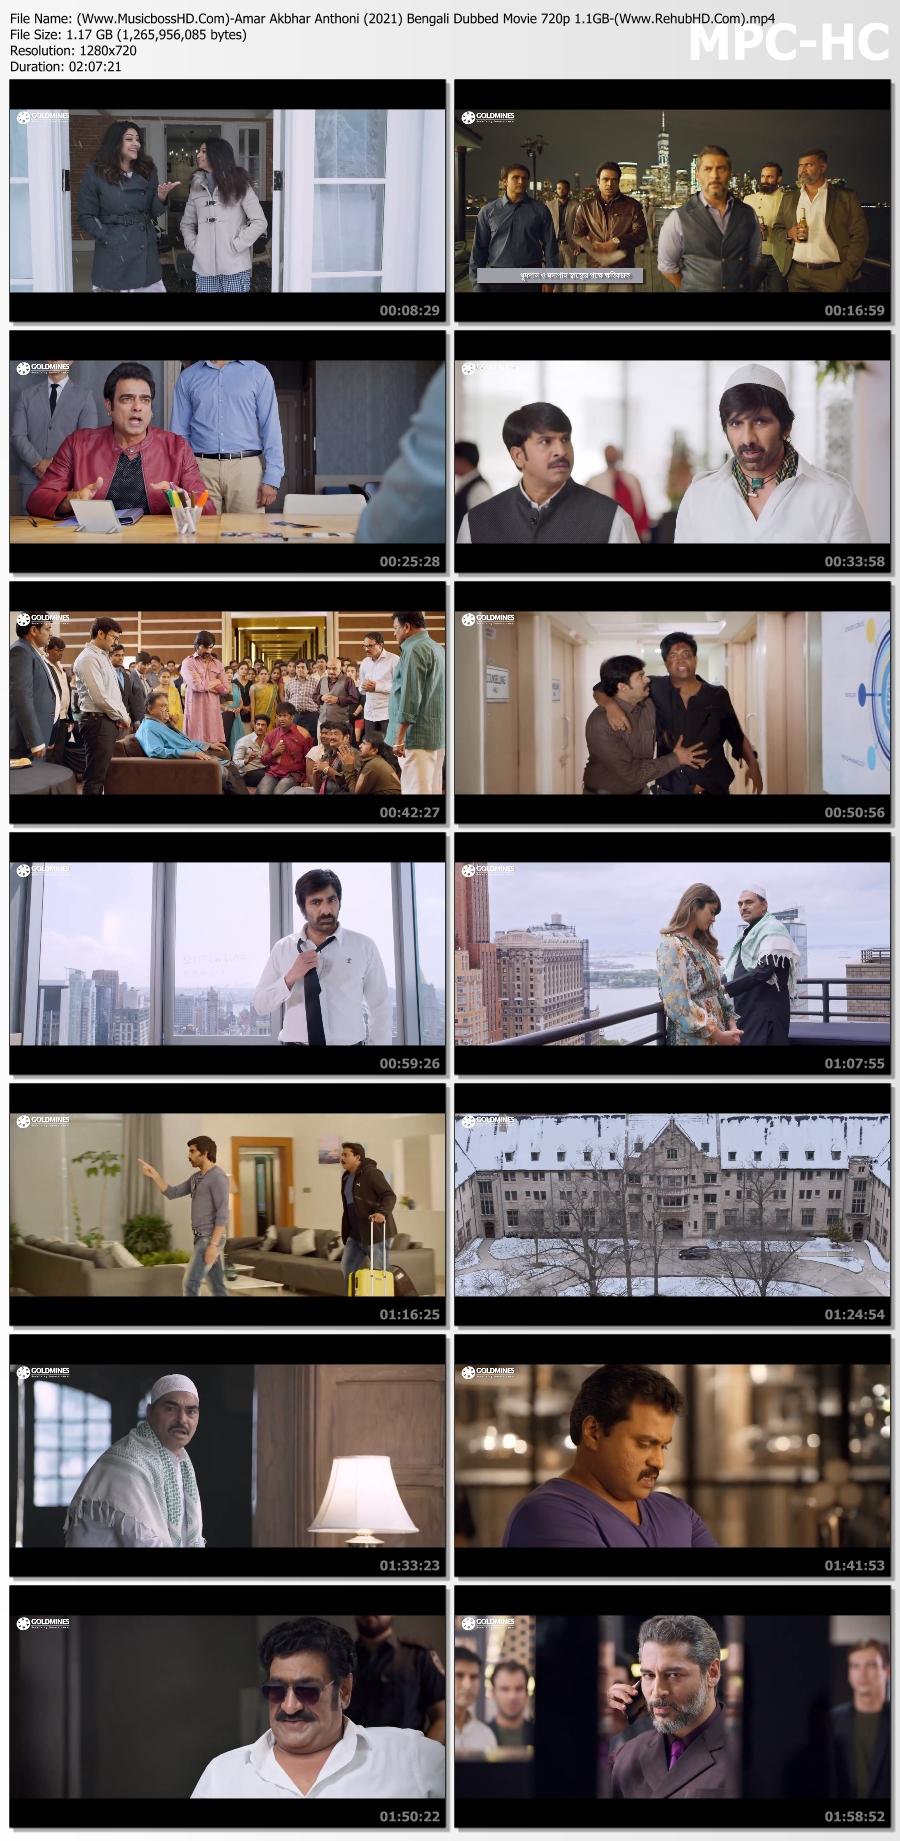 Www-Musicboss-HD-Com-Amar-Akbhar-Anthoni-2021-Bengali-Dubbed-Movie-720p-1-1-GB-Www-Rehub-HD-Com-mp4-